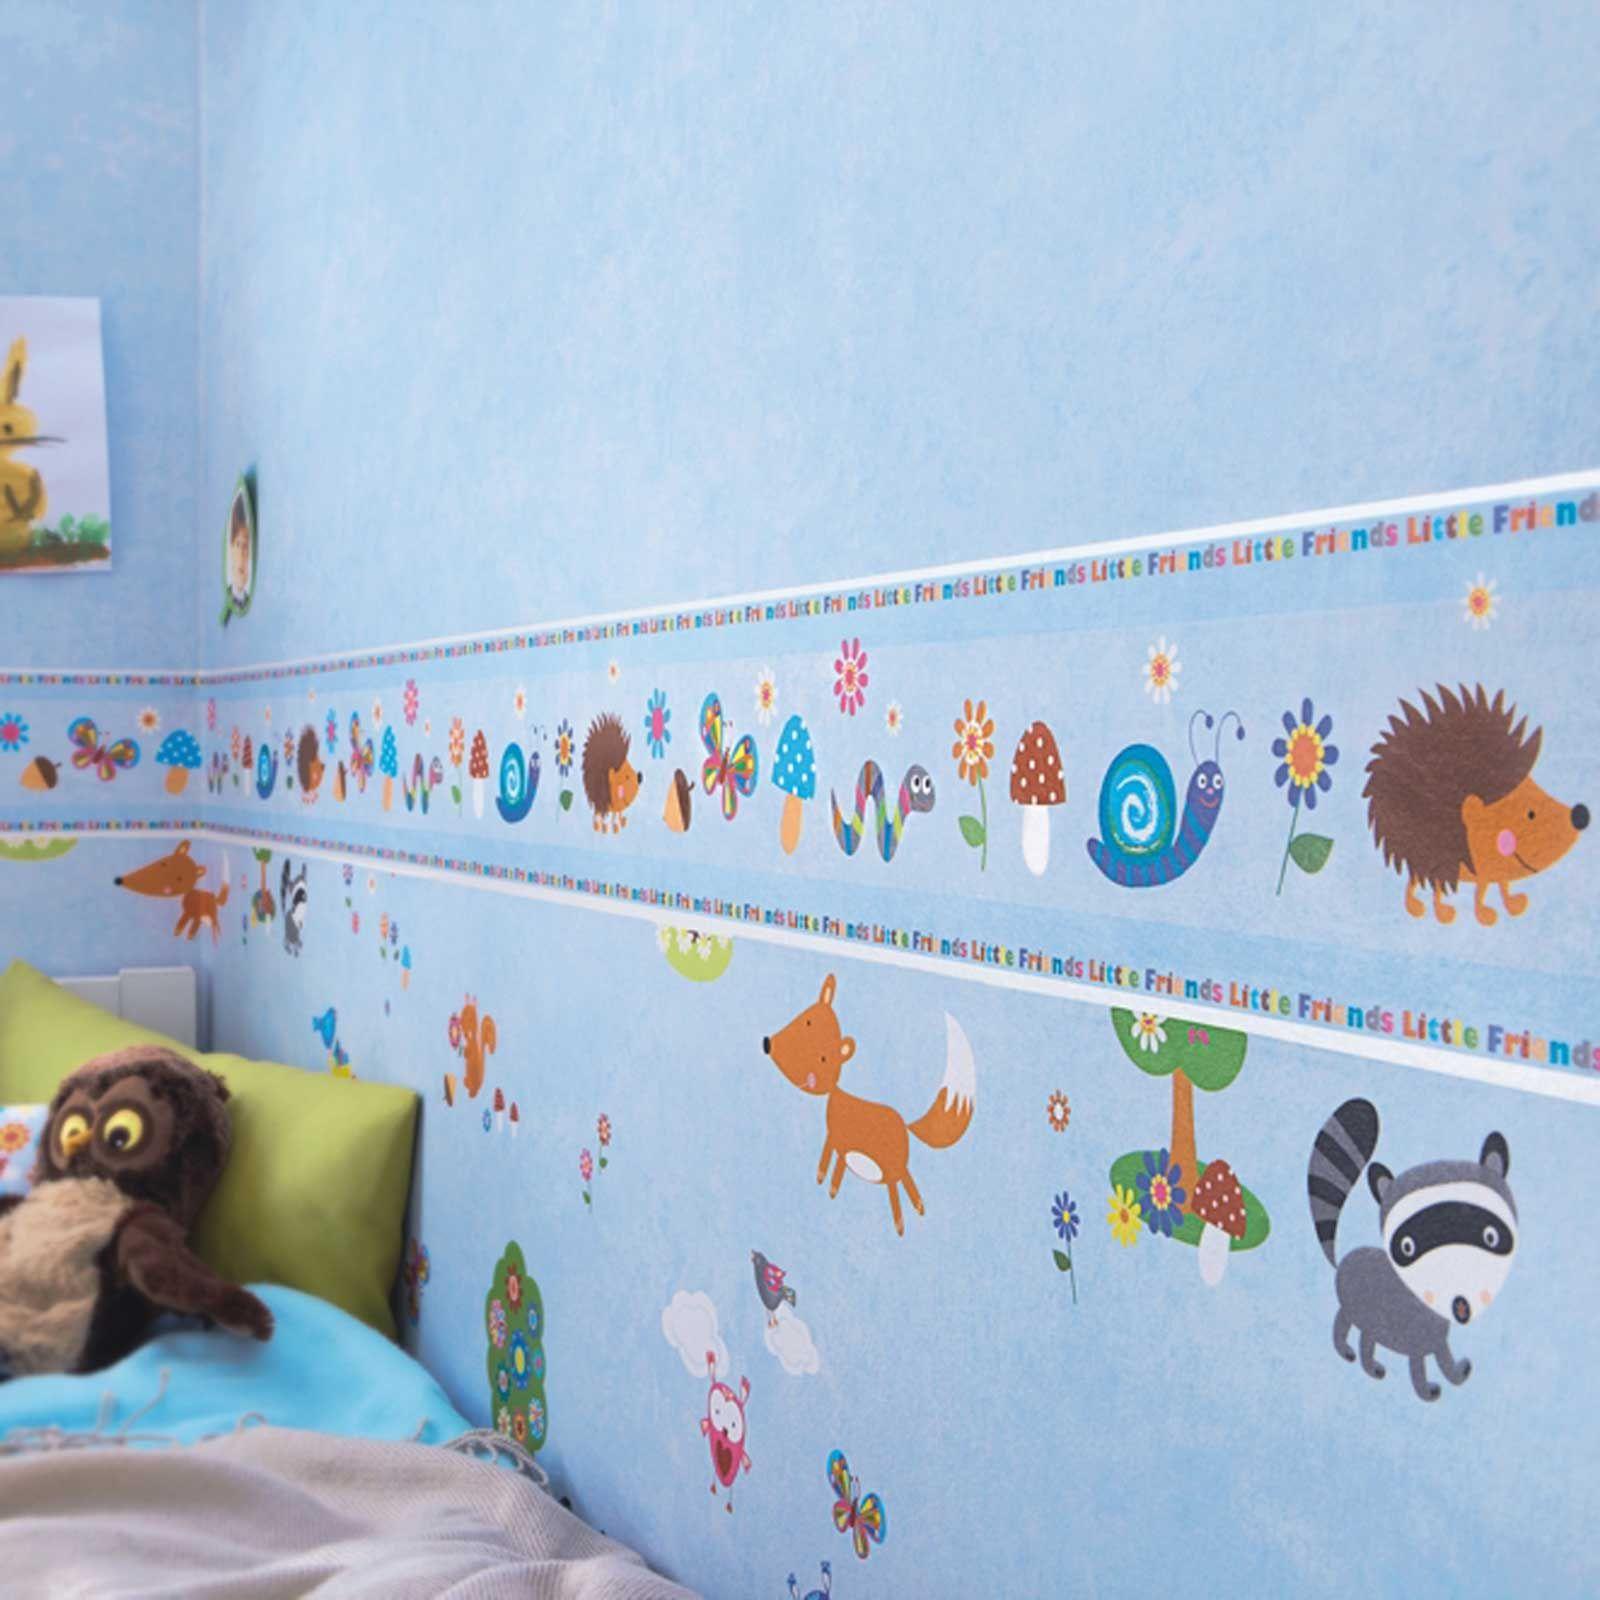 Ni a gen rico dormitorio cenefas papel pintado mariposa for Cenefas papel pintado